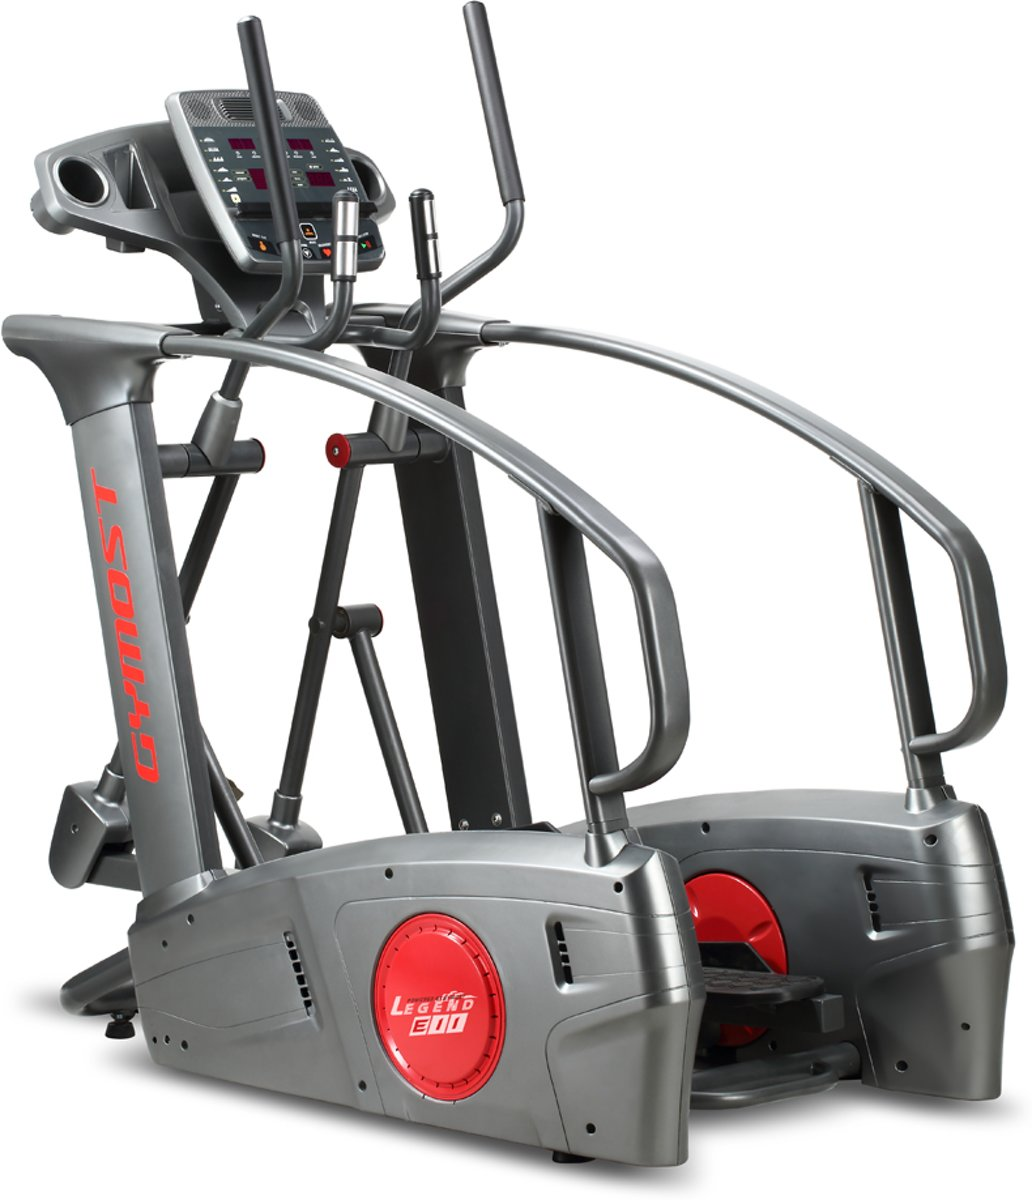 Crosstrainer - Gymost E11 Legend kopen